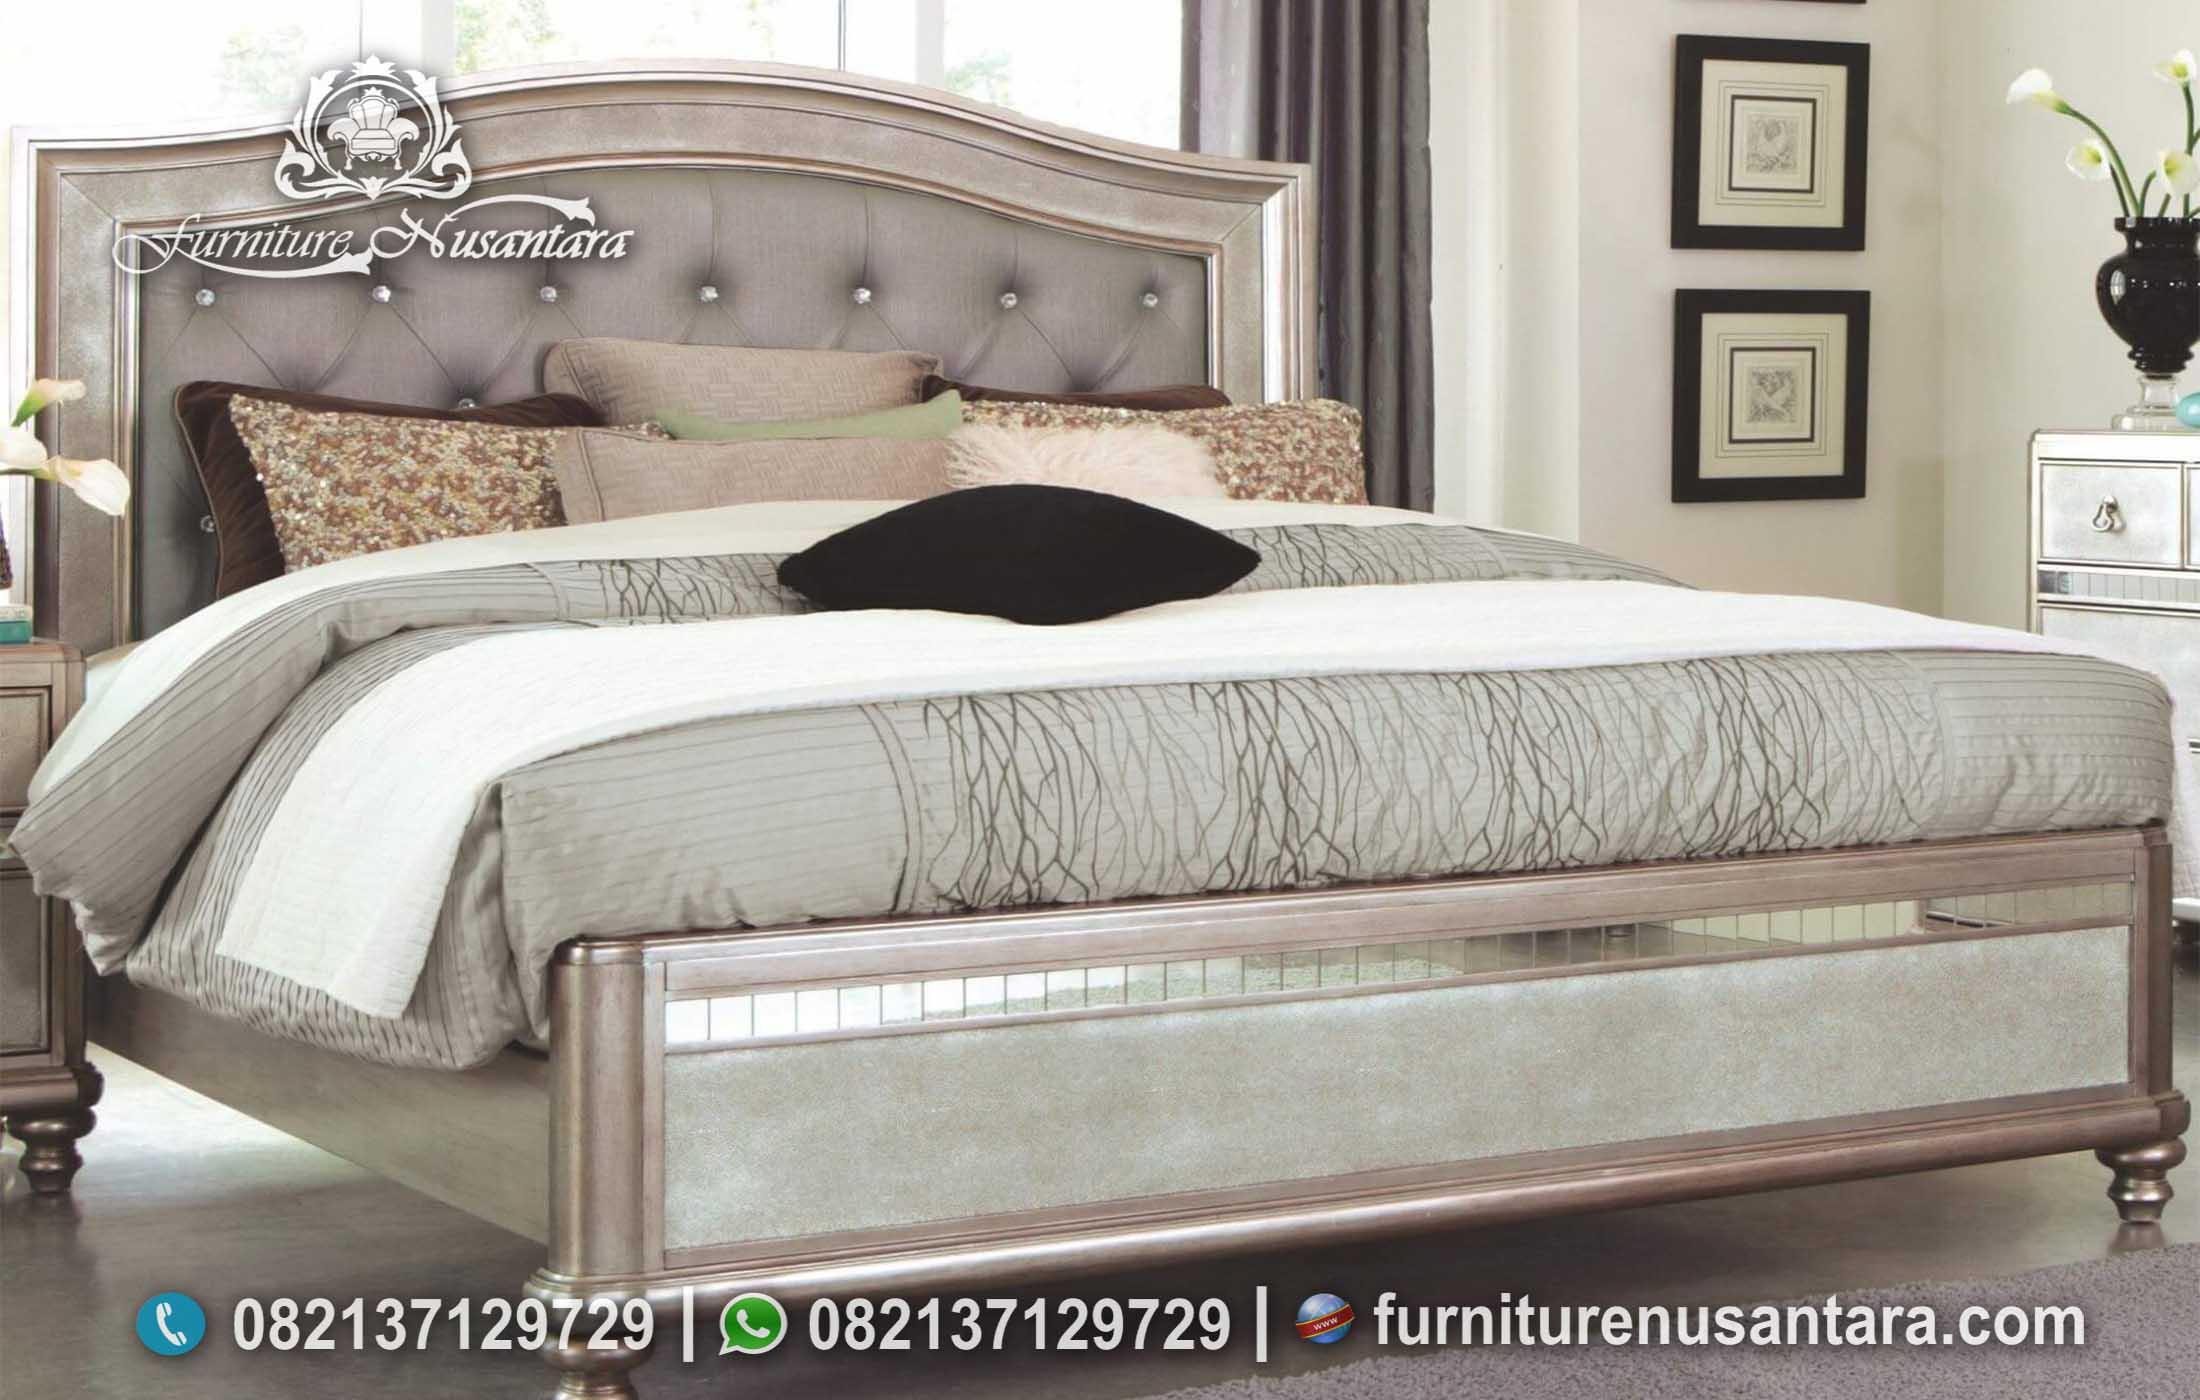 Jual Tempat Tidur Minimalis Simple Nyaman KS-230, Furniture Nusantara